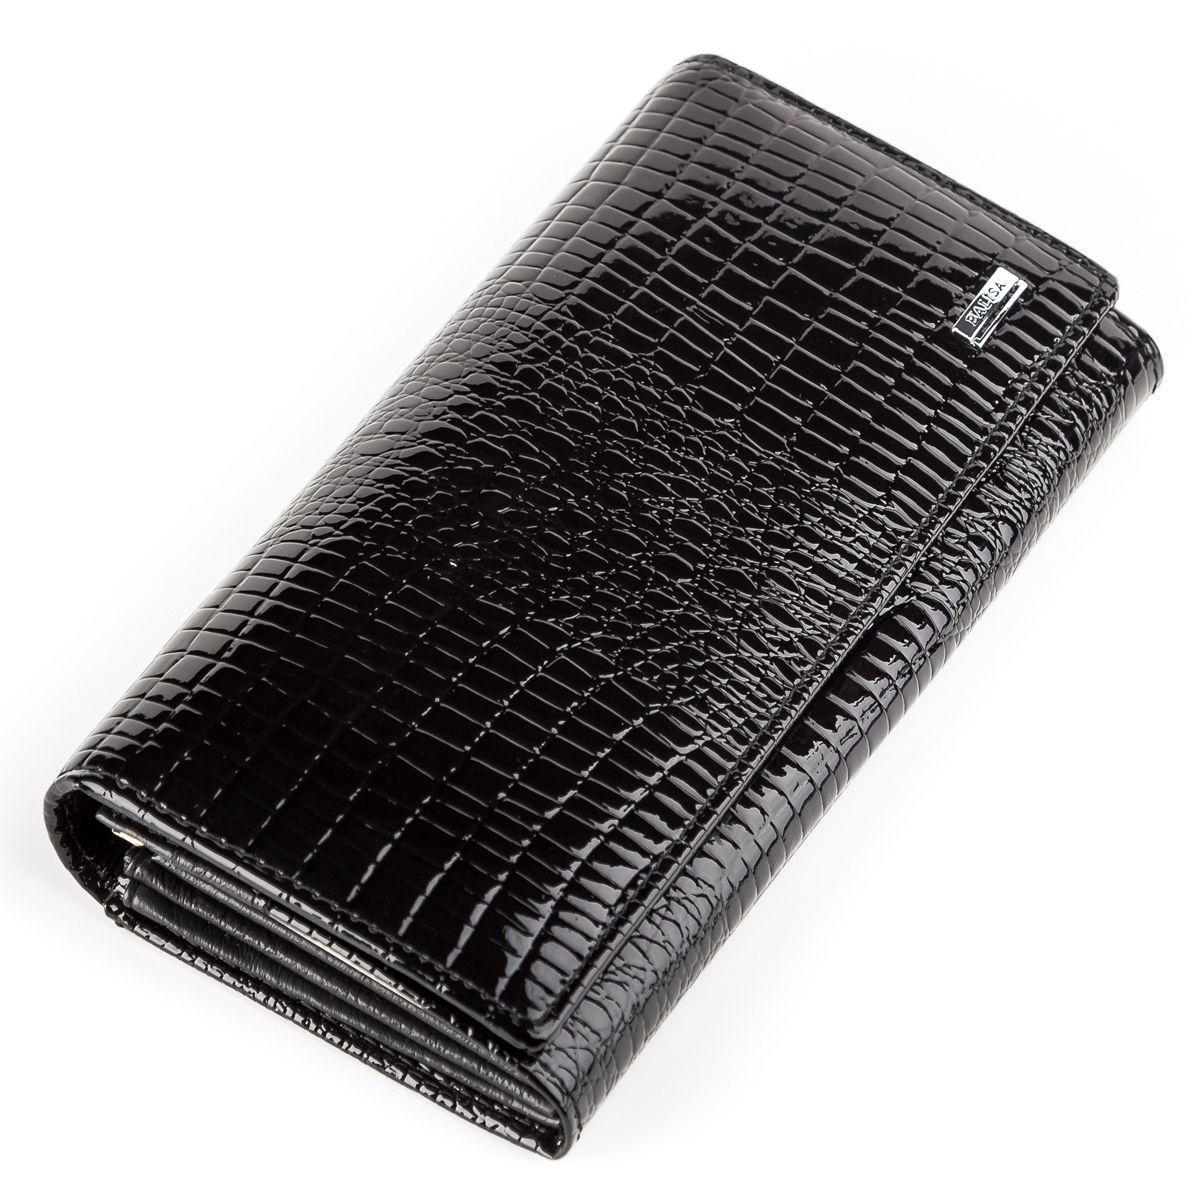 c804d321211c Кошелек женский BALISA 13853 кожаный Черный, Черный — только ...